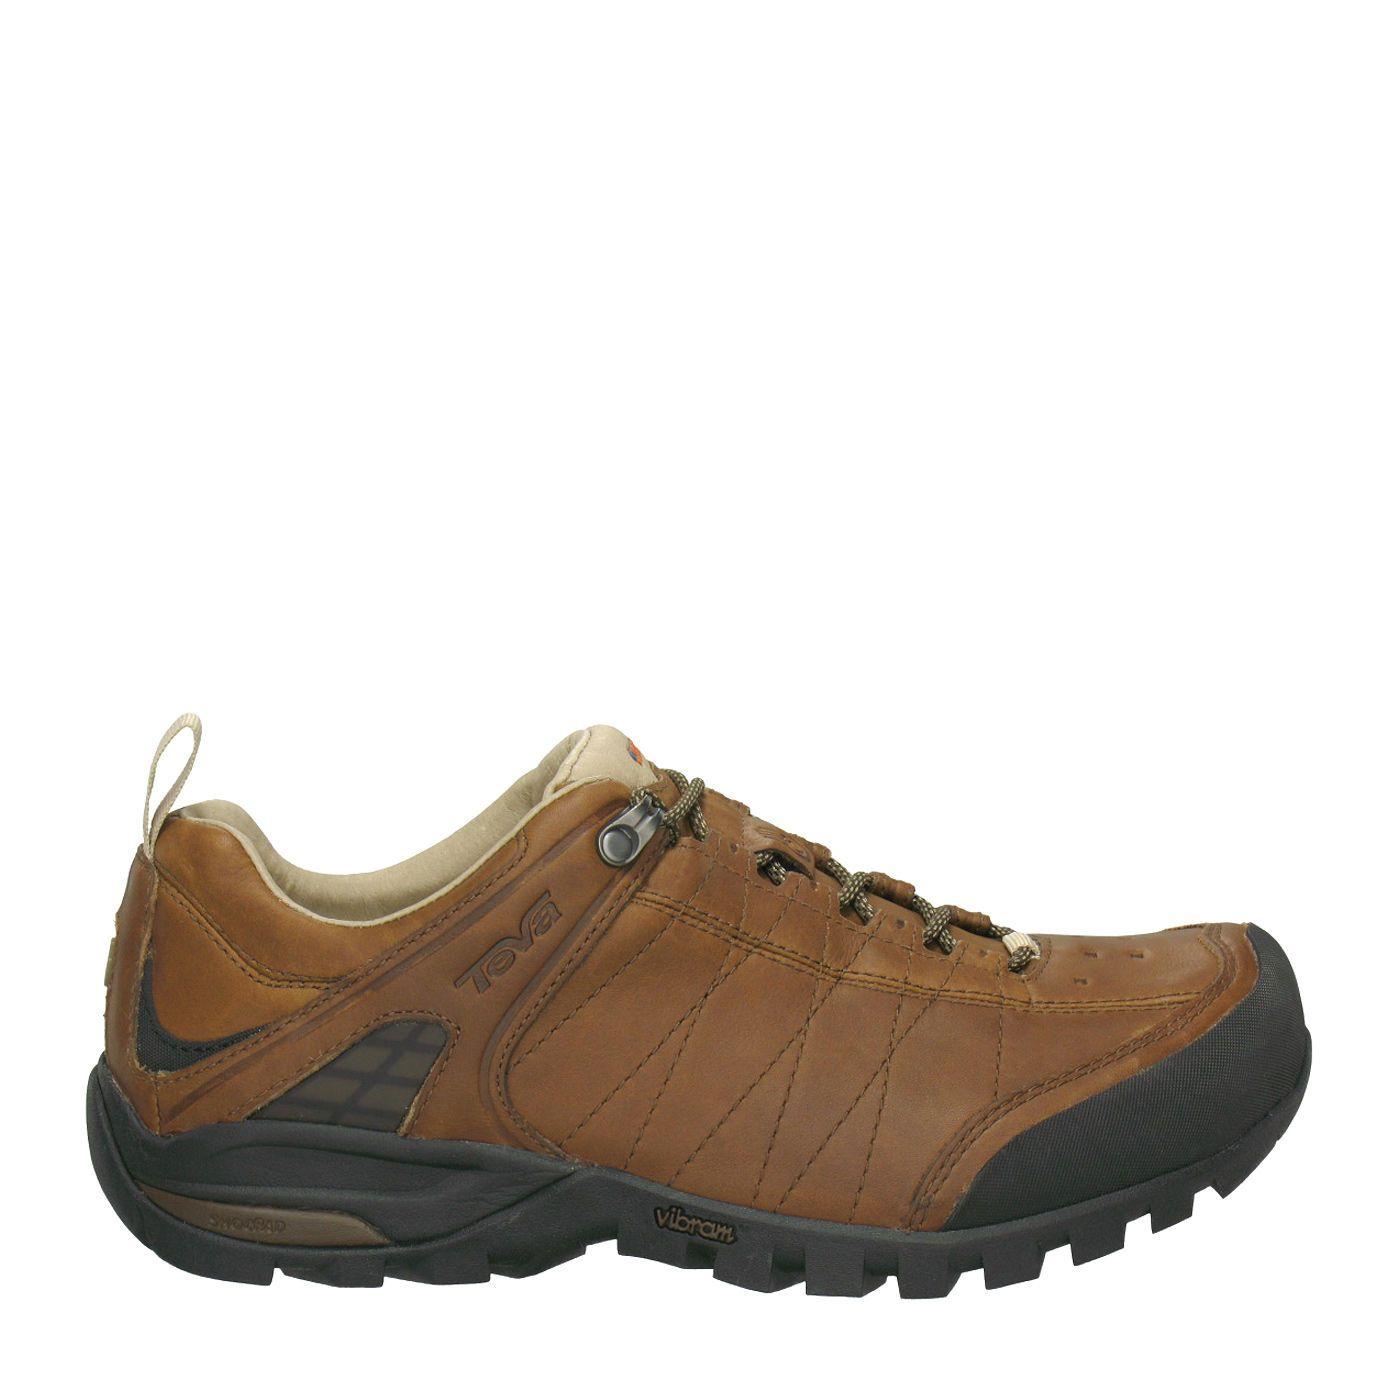 189147b4c255 Teva® Riva Leather eVent for Men